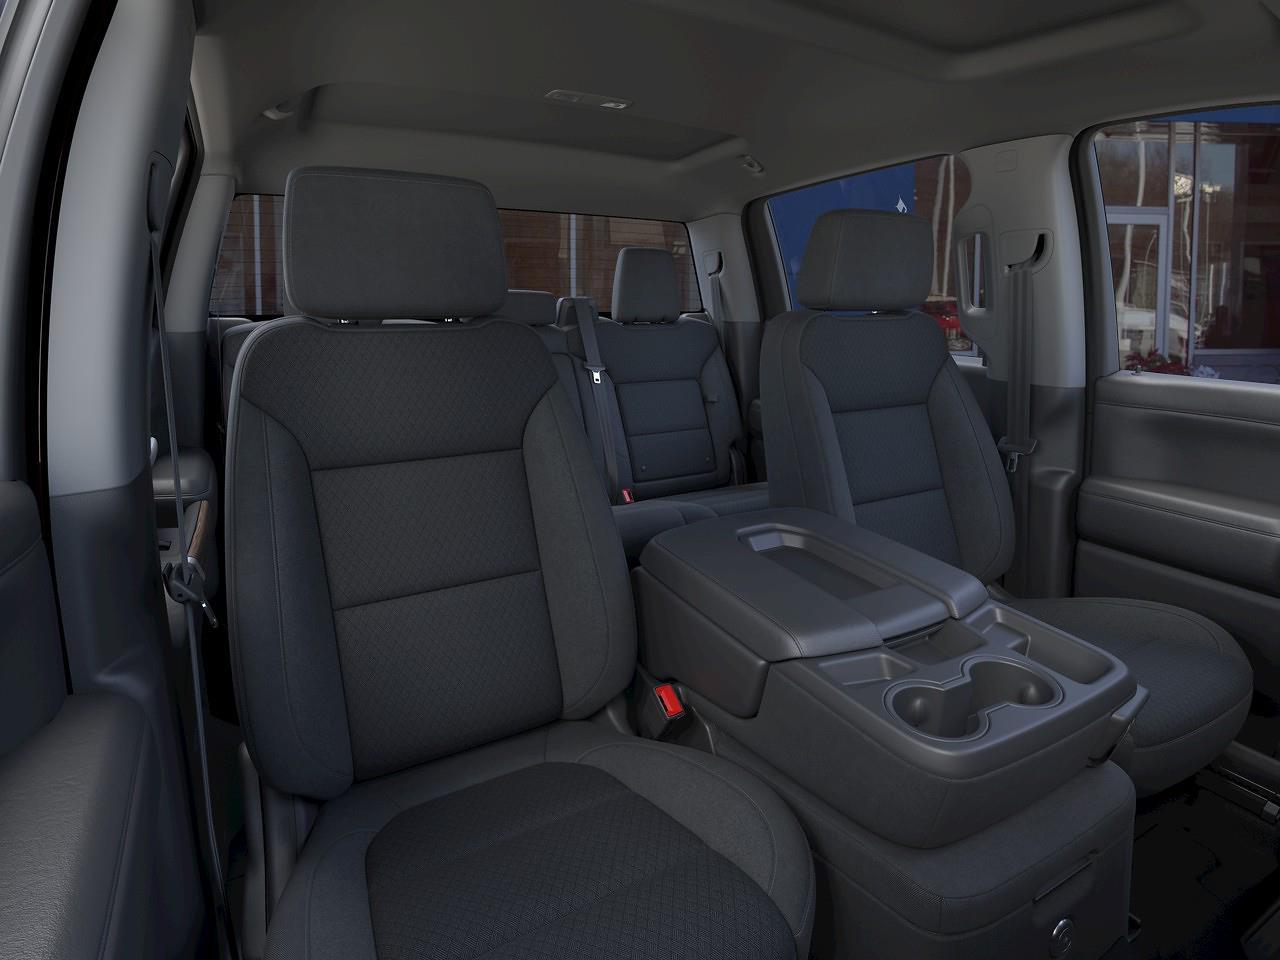 2021 Chevrolet Silverado 1500 Crew Cab 4x4, Pickup #CK1552 - photo 12